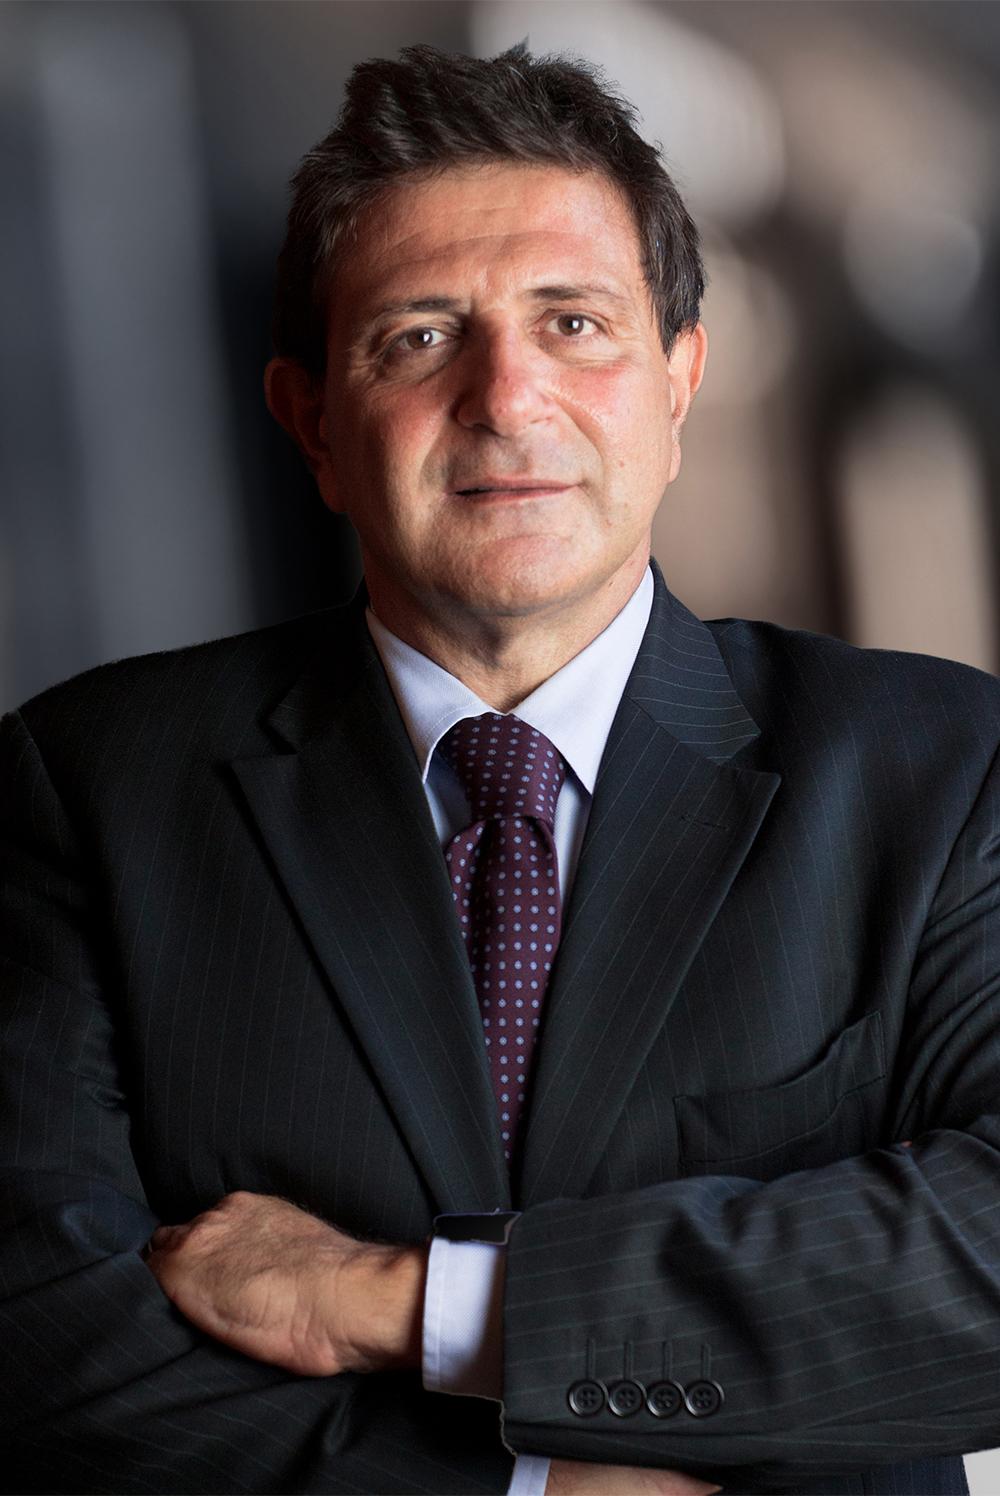 Nicola Ceraolo